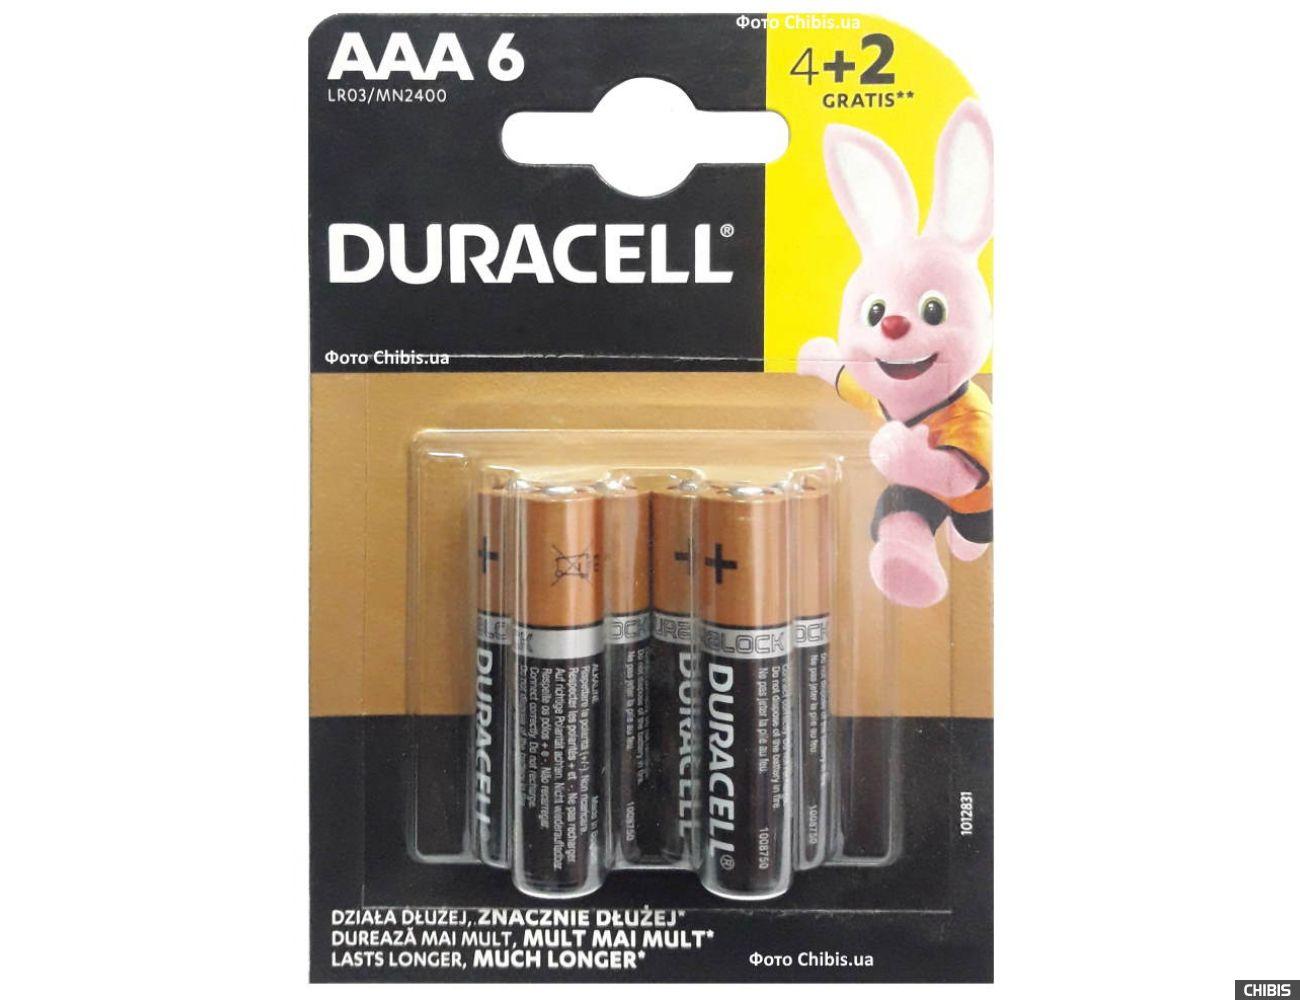 Duracell AAA Basic LR03 1.5V Alkaline 4+2 блистер 6 шт